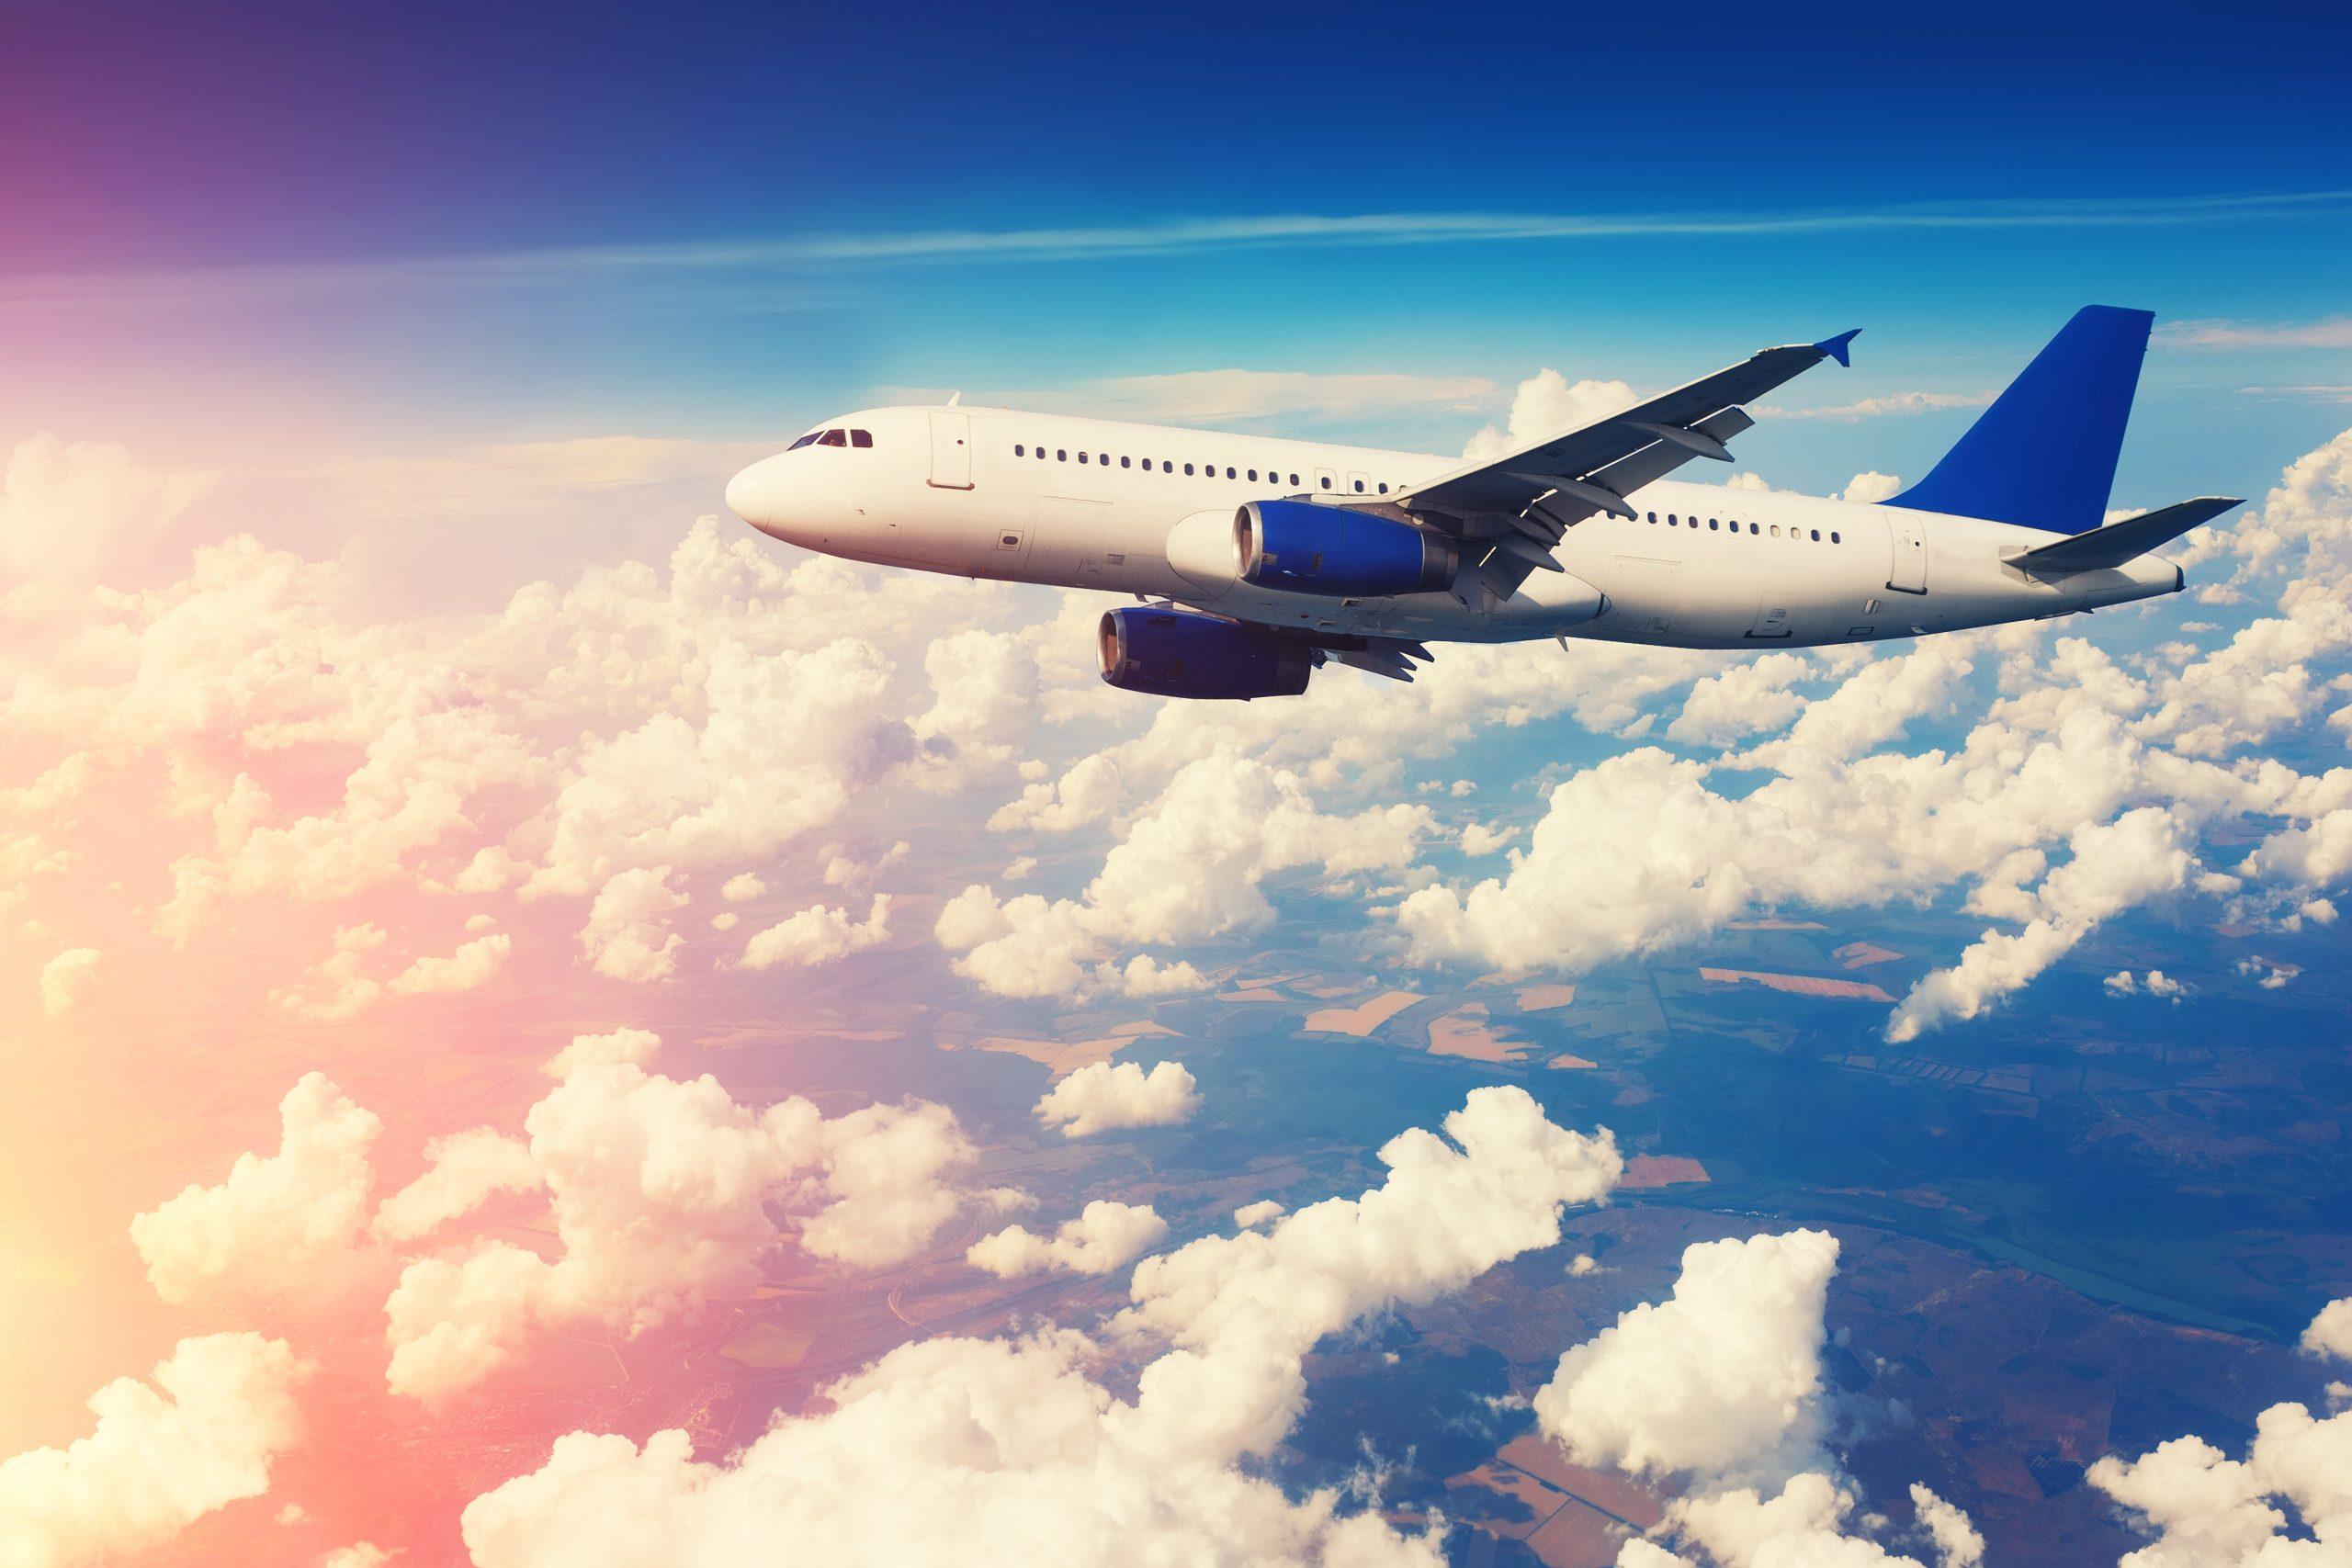 Passenger jet flying through clouds